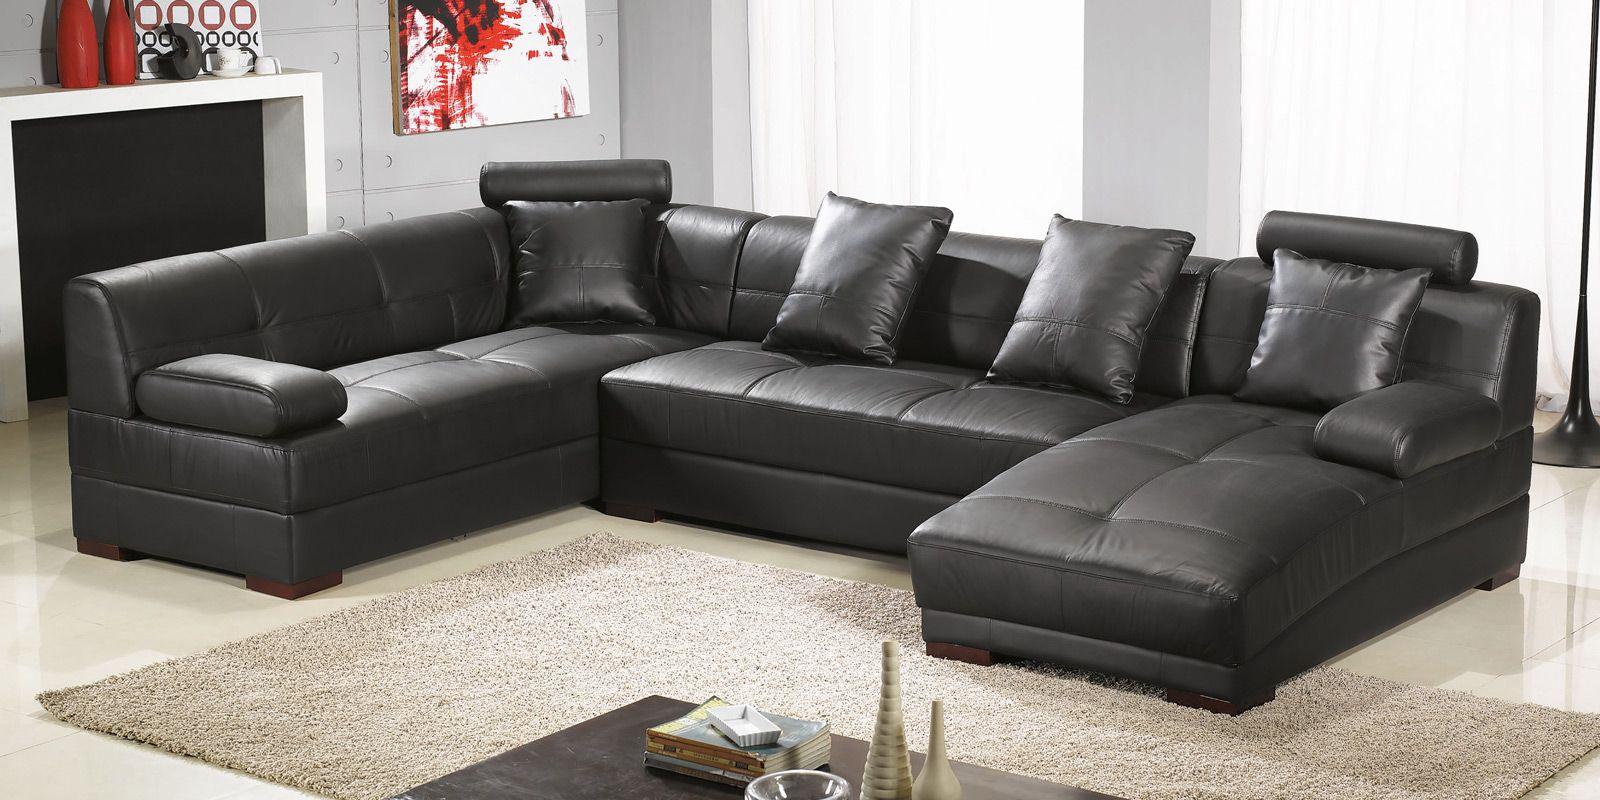 xxl sofa u form, wohnlandschaft ledersofa baretta xxl u-form ledersofa | designer, Design ideen